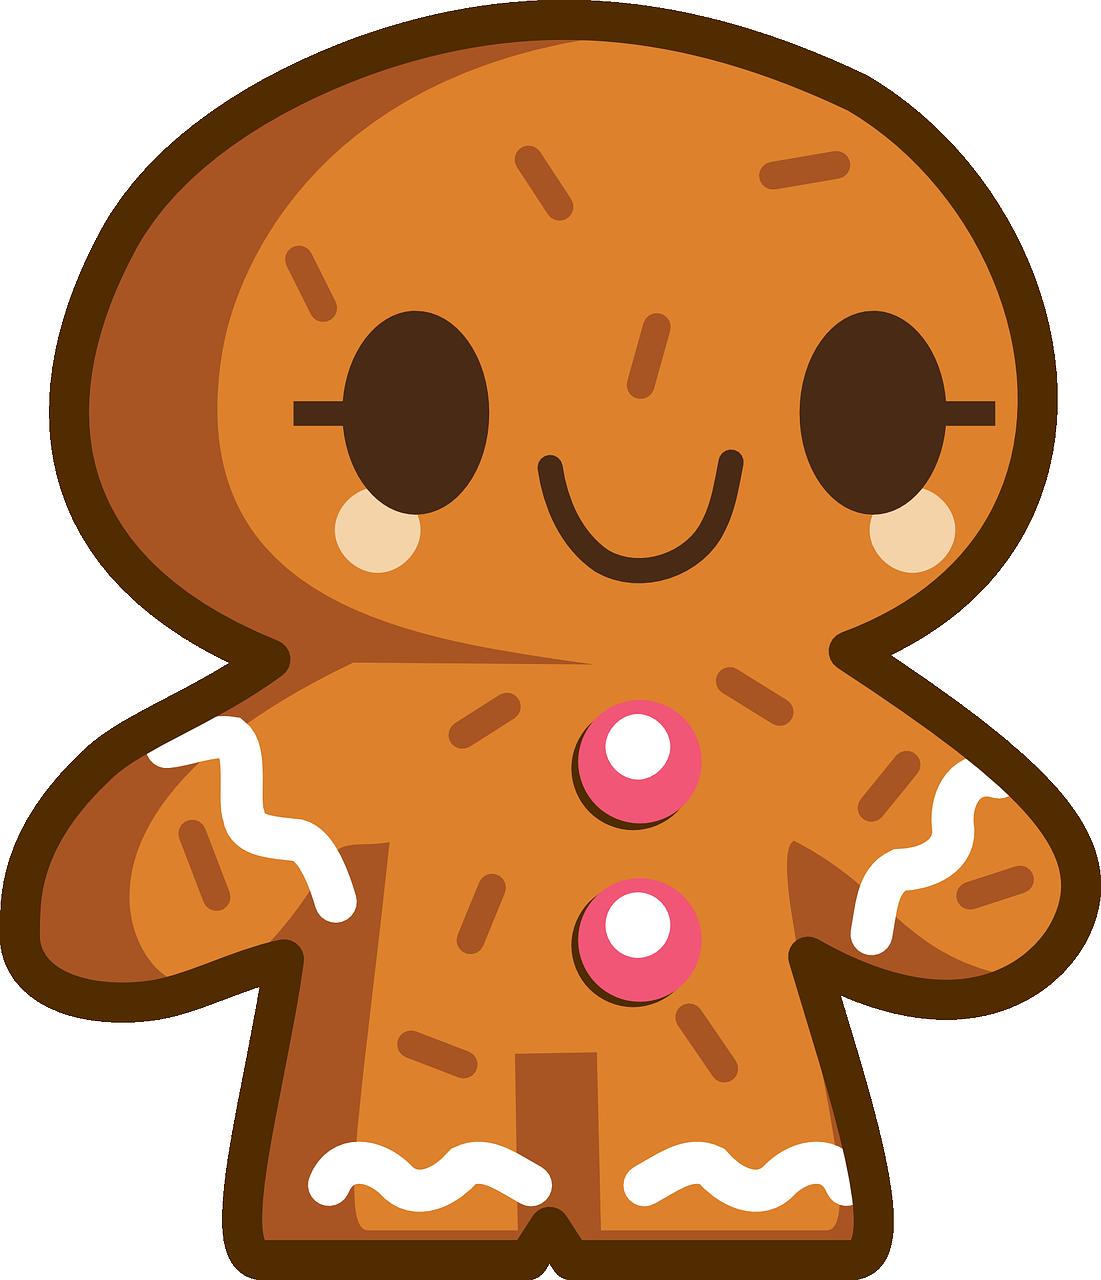 gingerman, biscuit, gingerbread